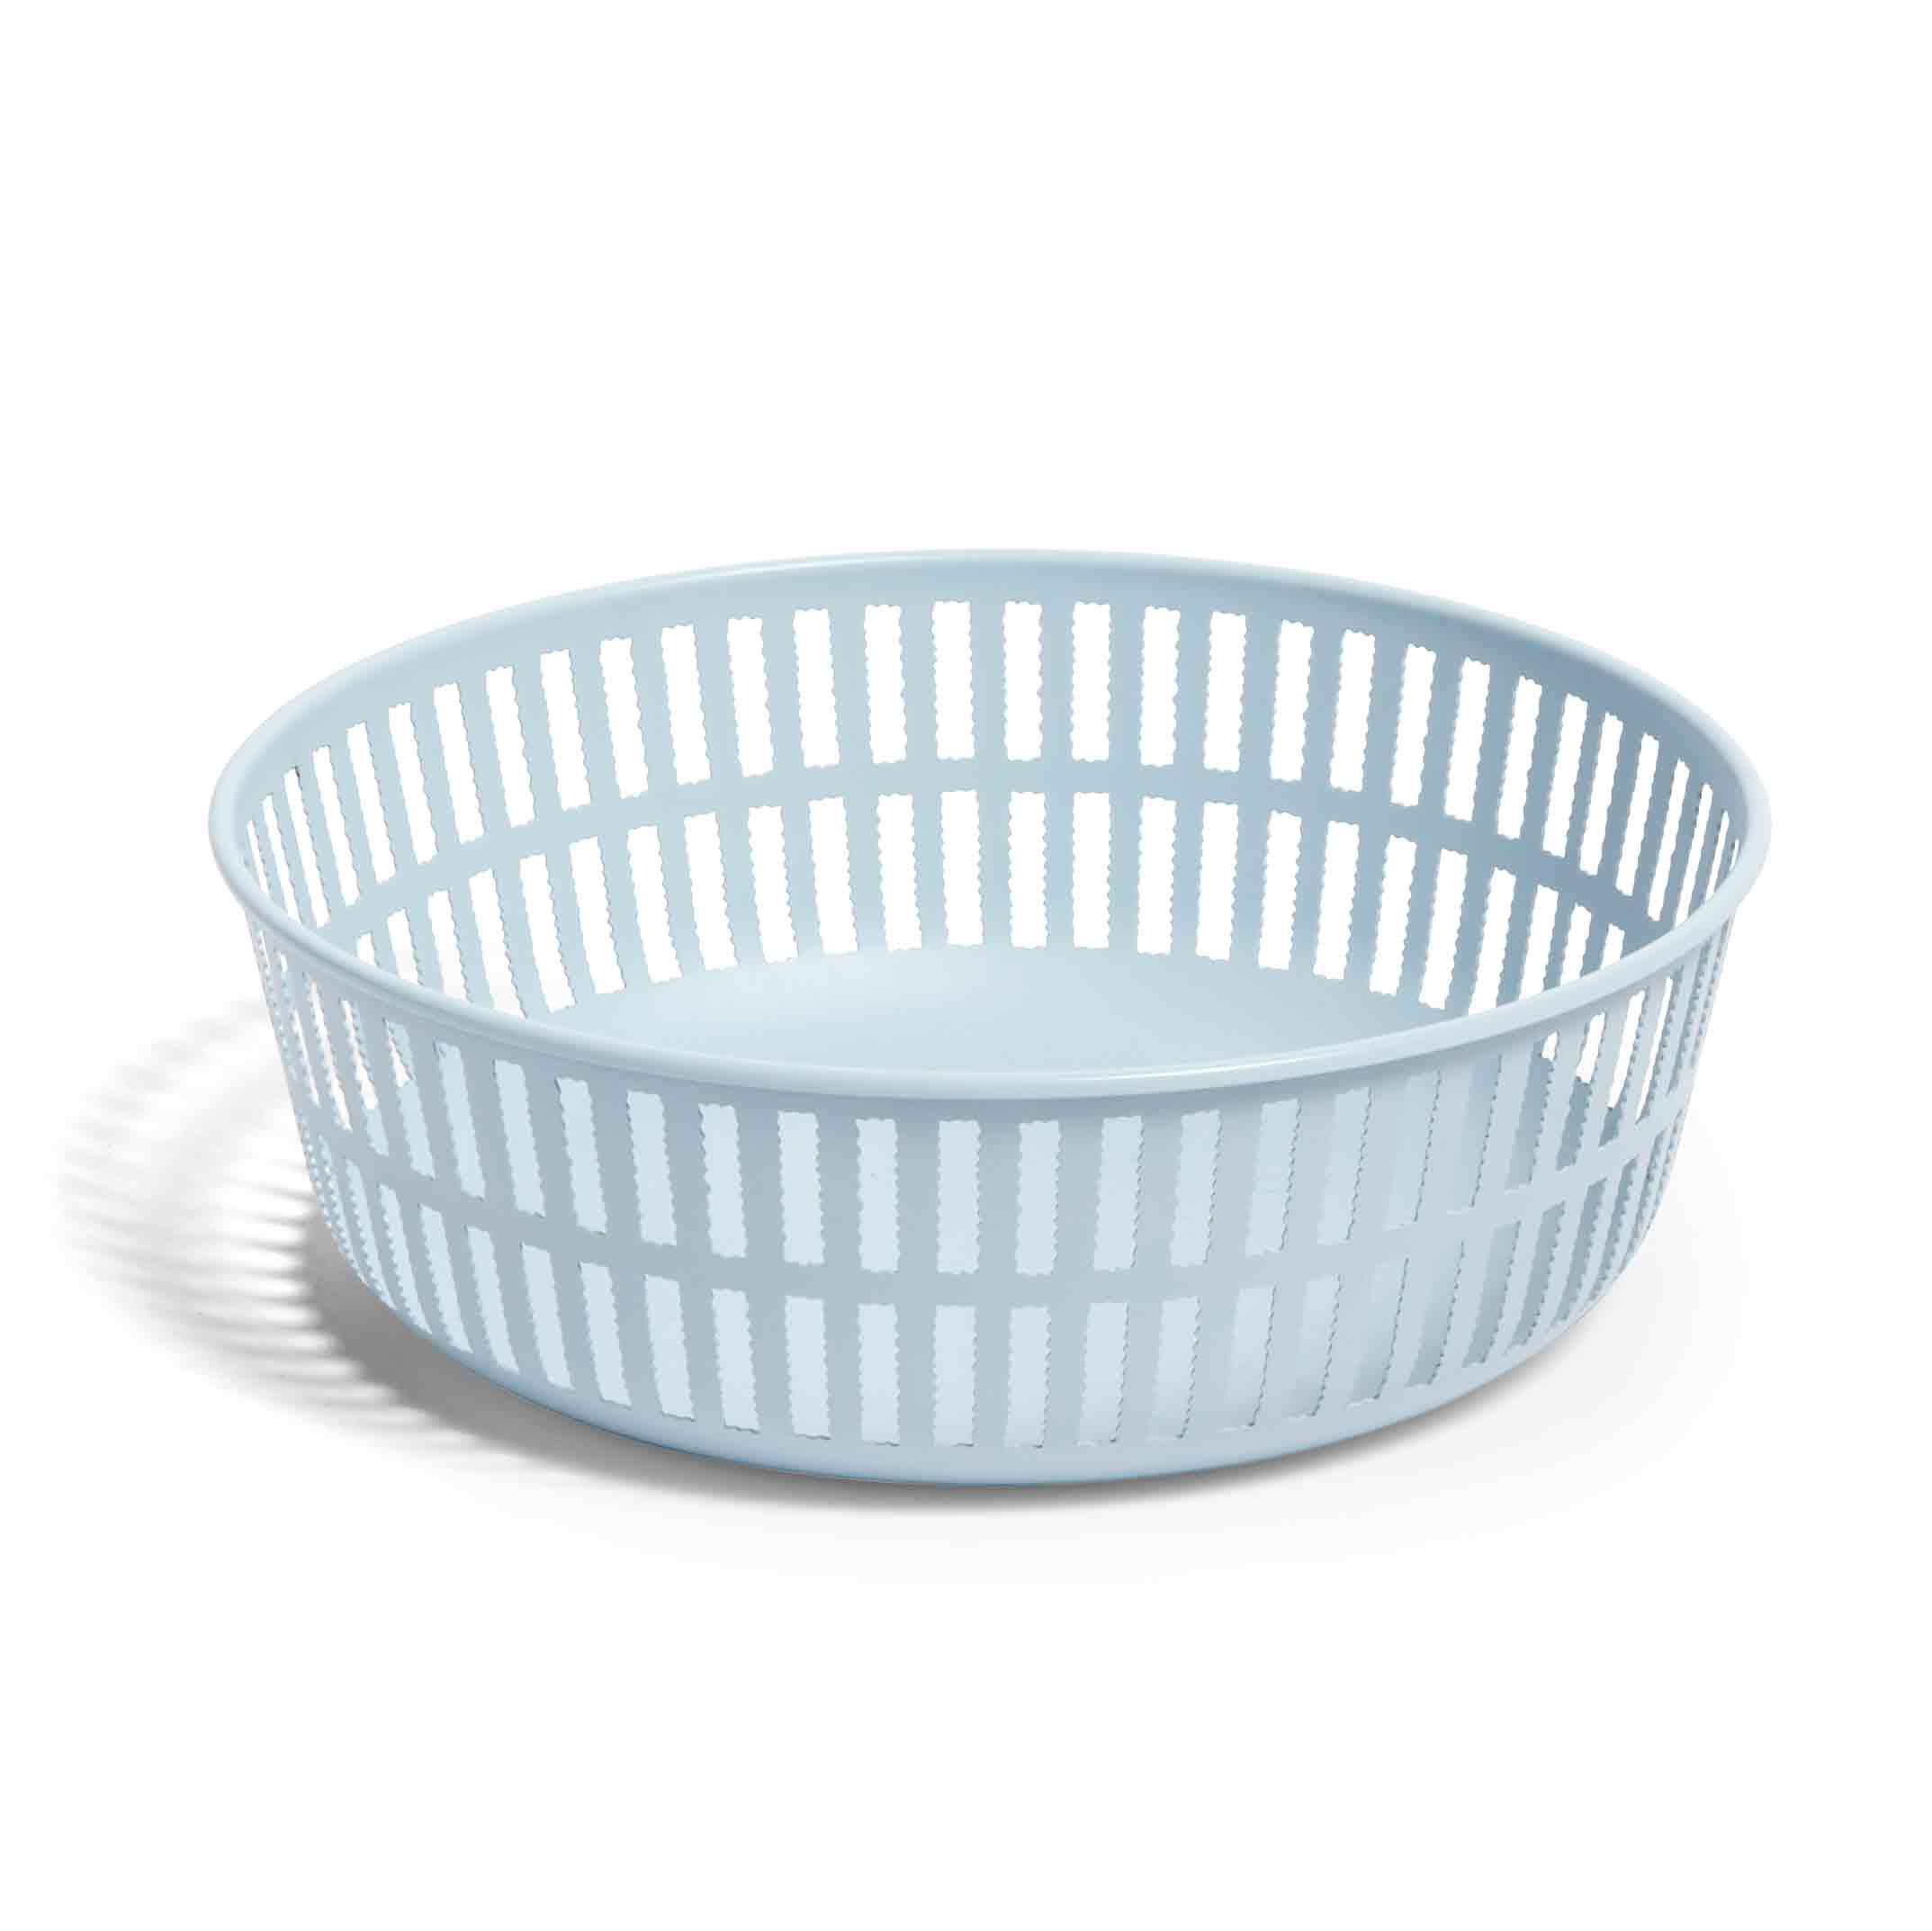 Hay-Panier Basket Round, Light Blue